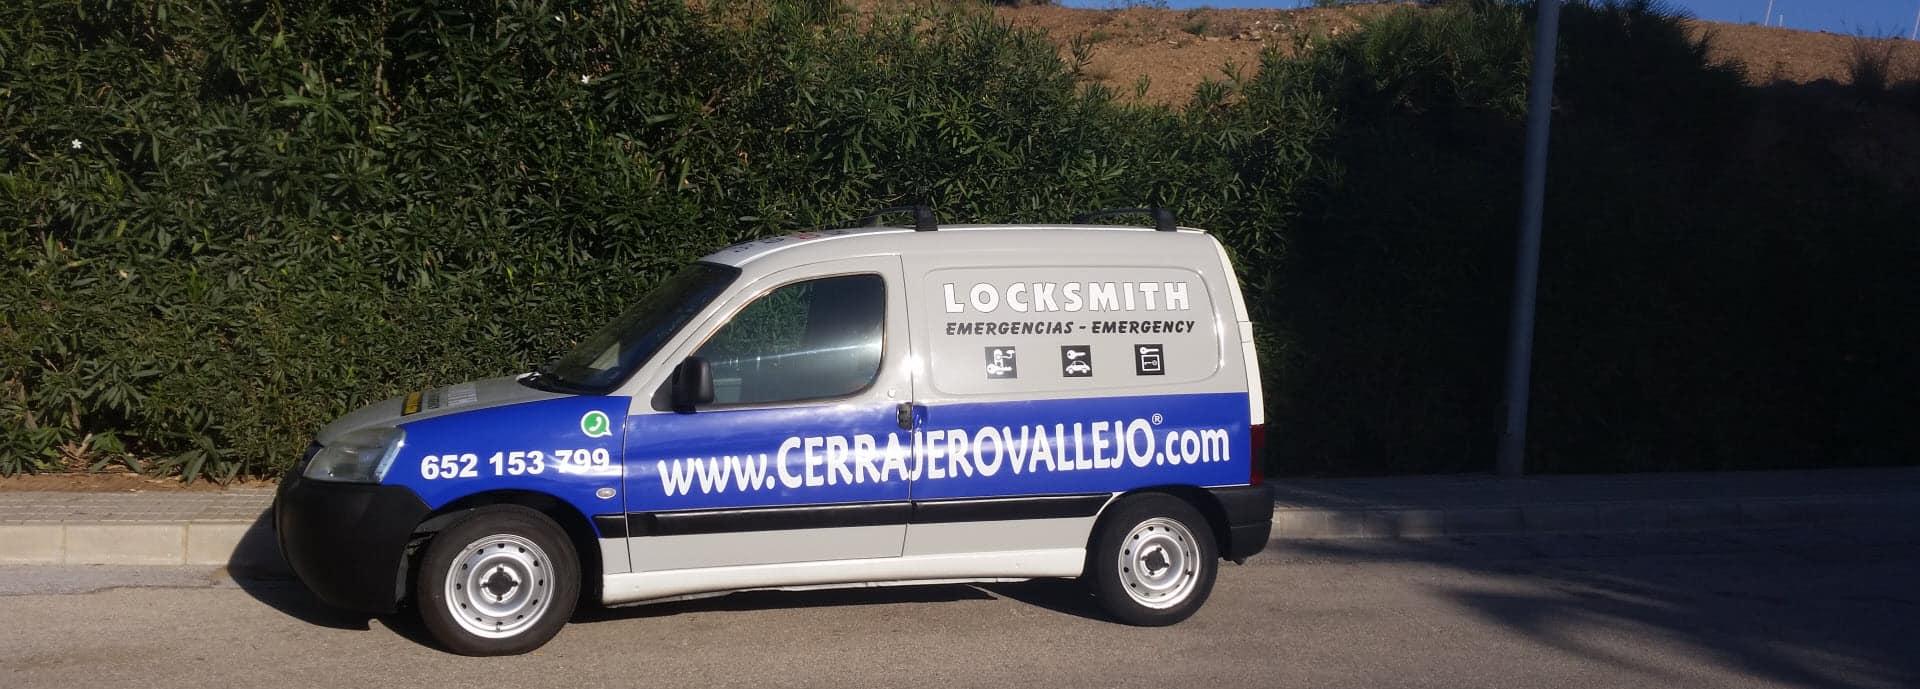 Cerrajero Mijas, Benalmadena, Fuengirola, Marbella